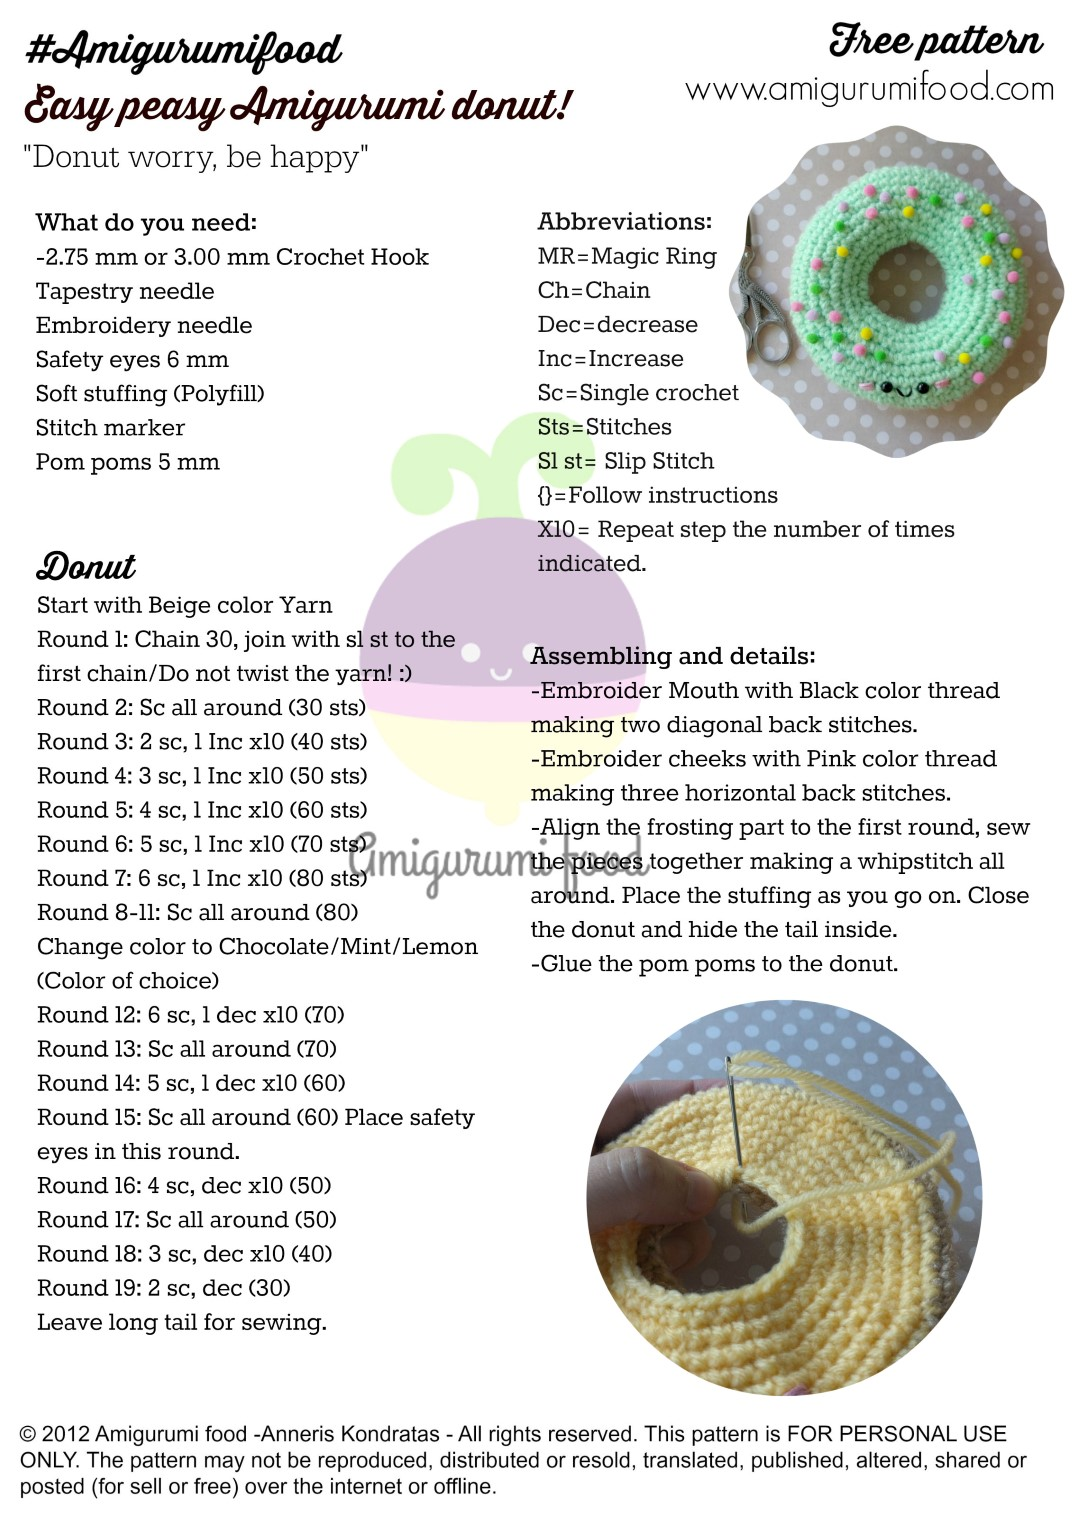 Amigurumi Donut Patron : Amigurumi Food